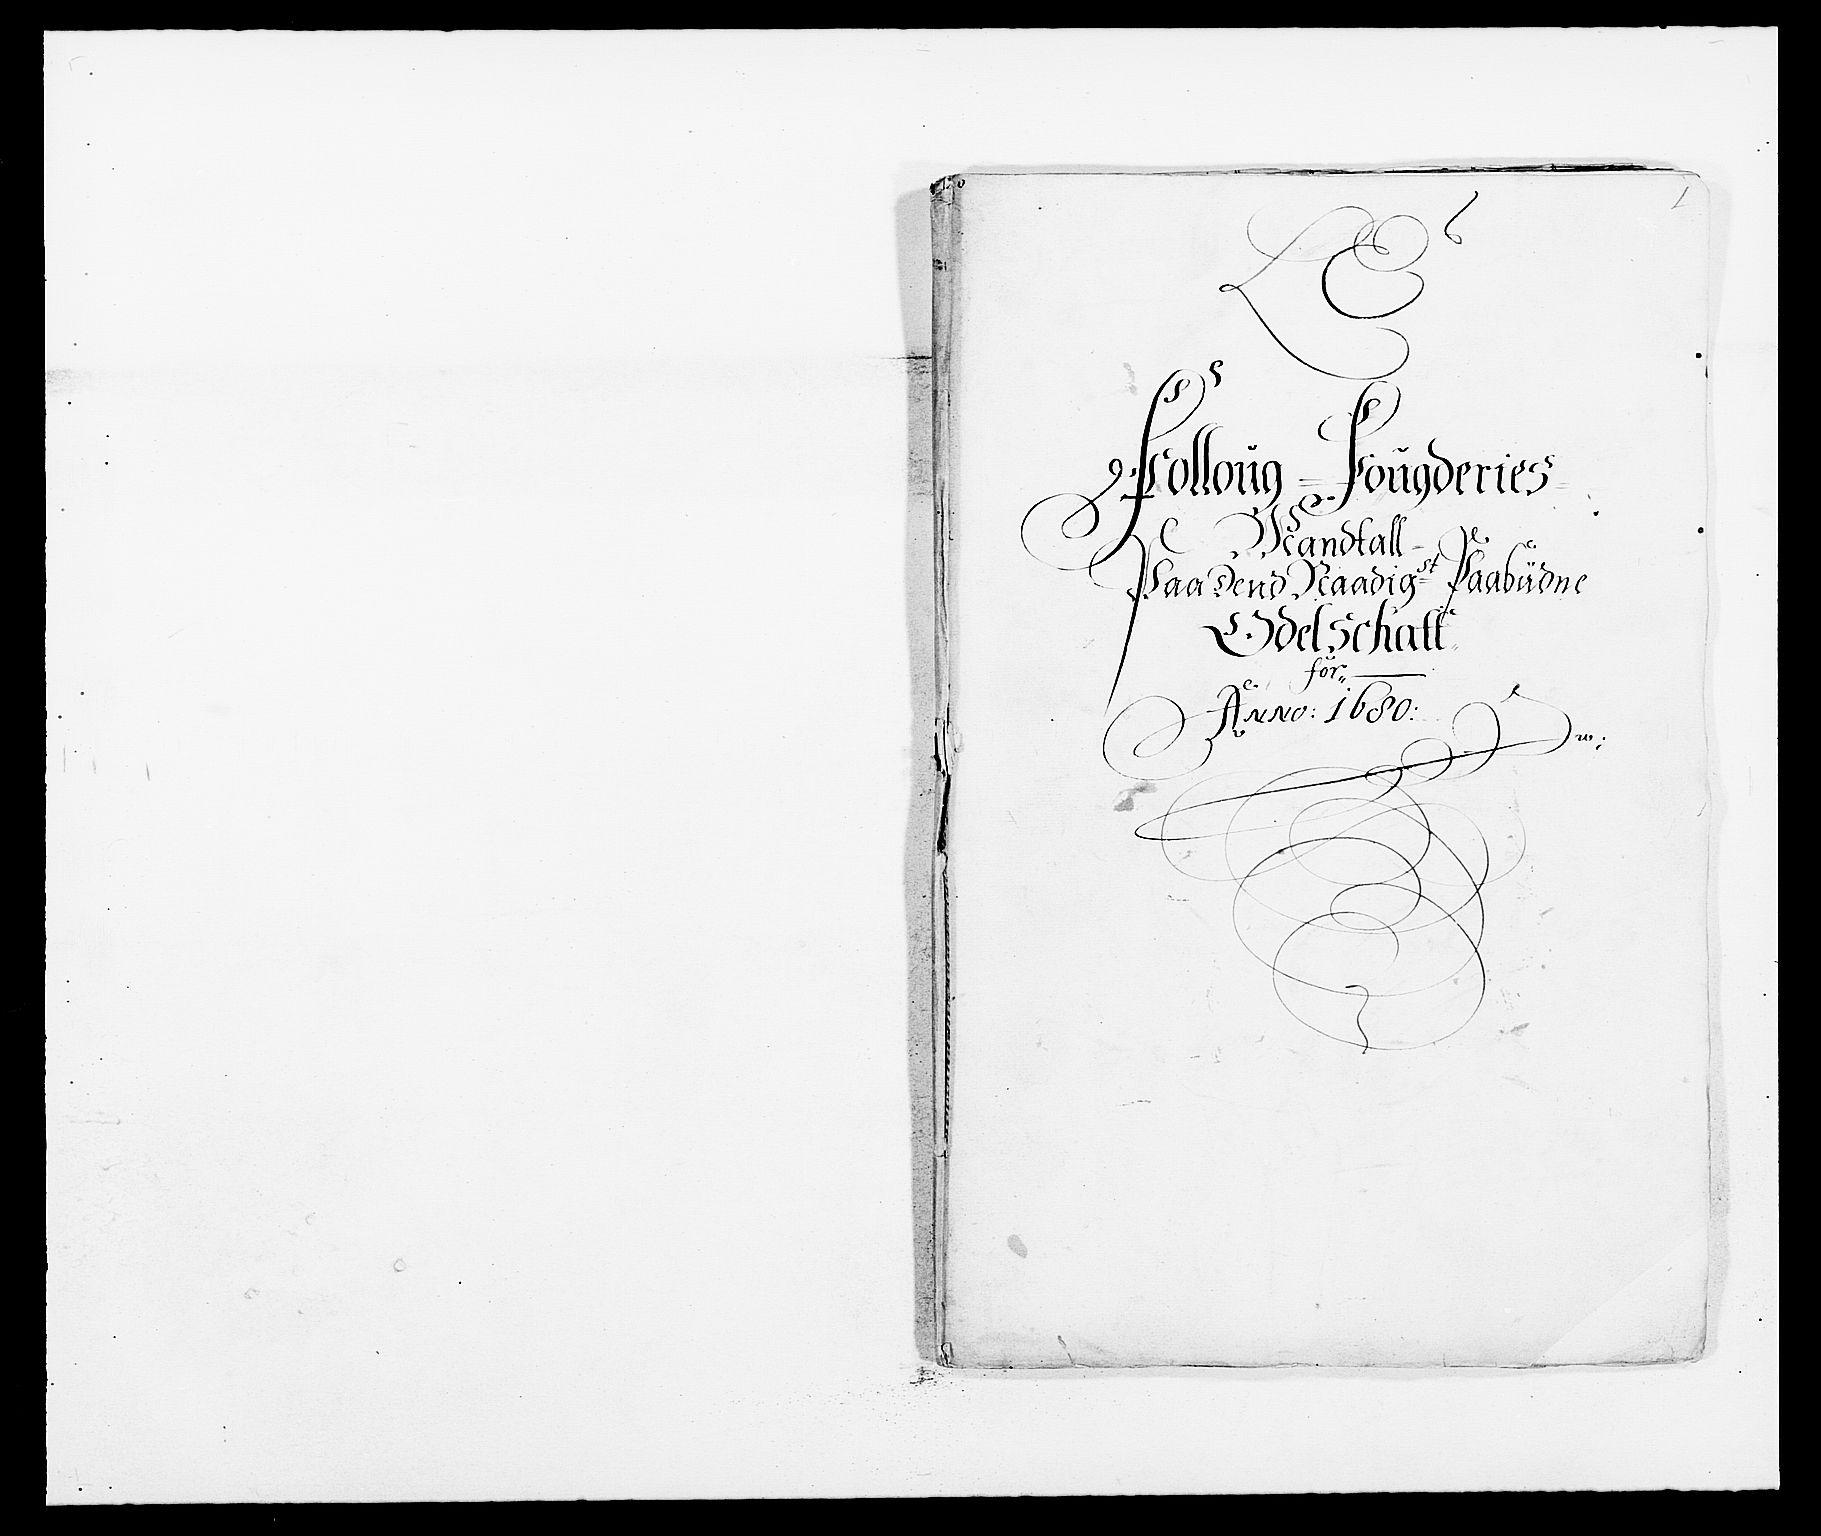 RA, Rentekammeret inntil 1814, Reviderte regnskaper, Fogderegnskap, R09/L0429: Fogderegnskap Follo, 1680-1681, s. 122